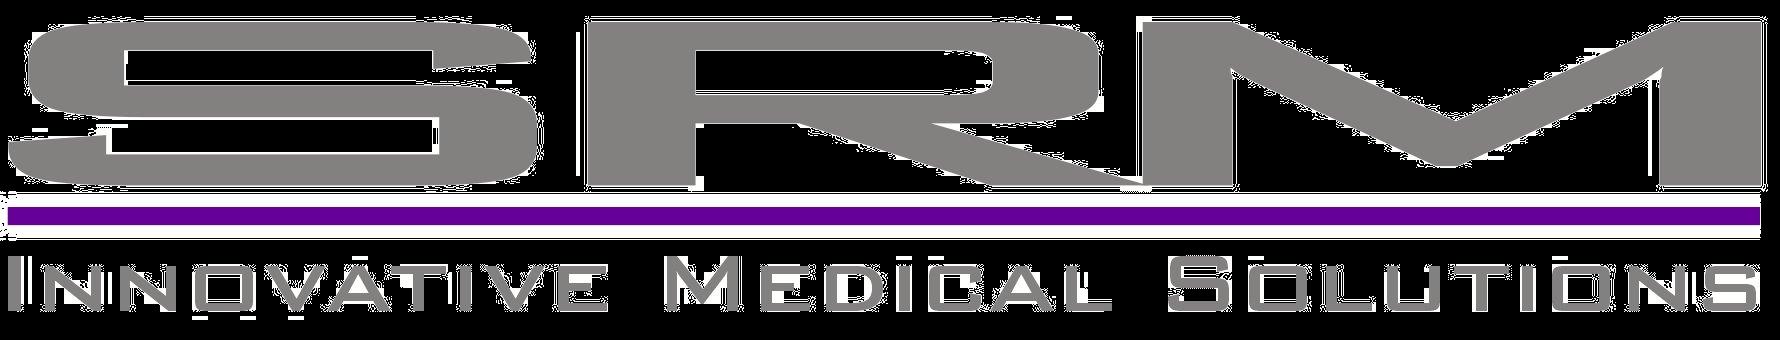 SR-Medizinelektronik